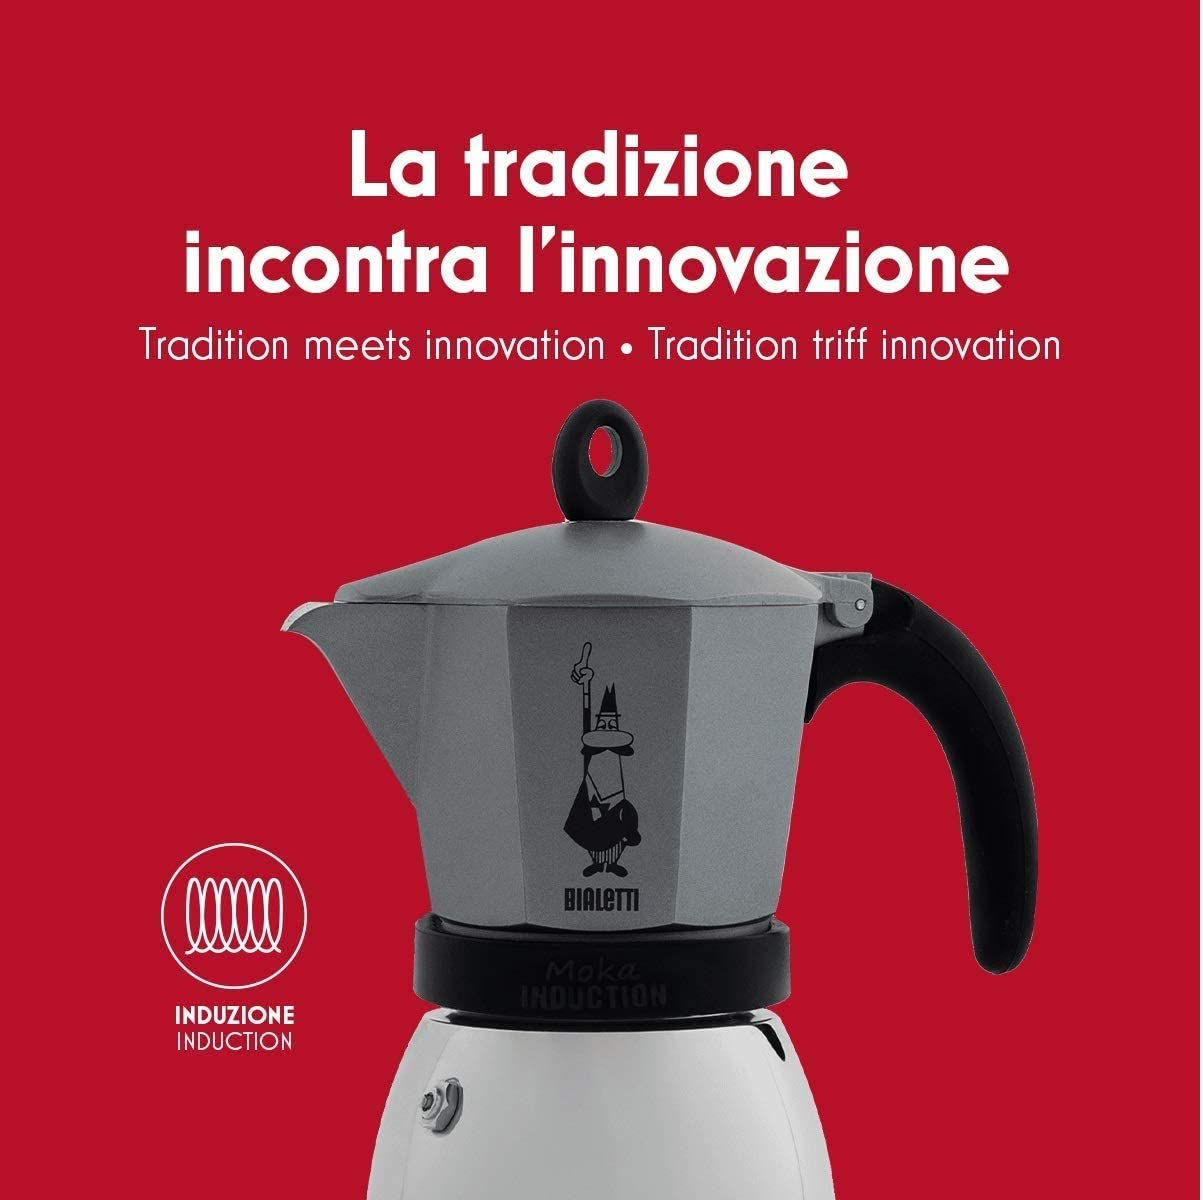 Bialetti Moka Induction Cafetera Italiana Espreso por Inducción, Aluminio, Negro, 6 Tazas: Amazon.es: Hogar